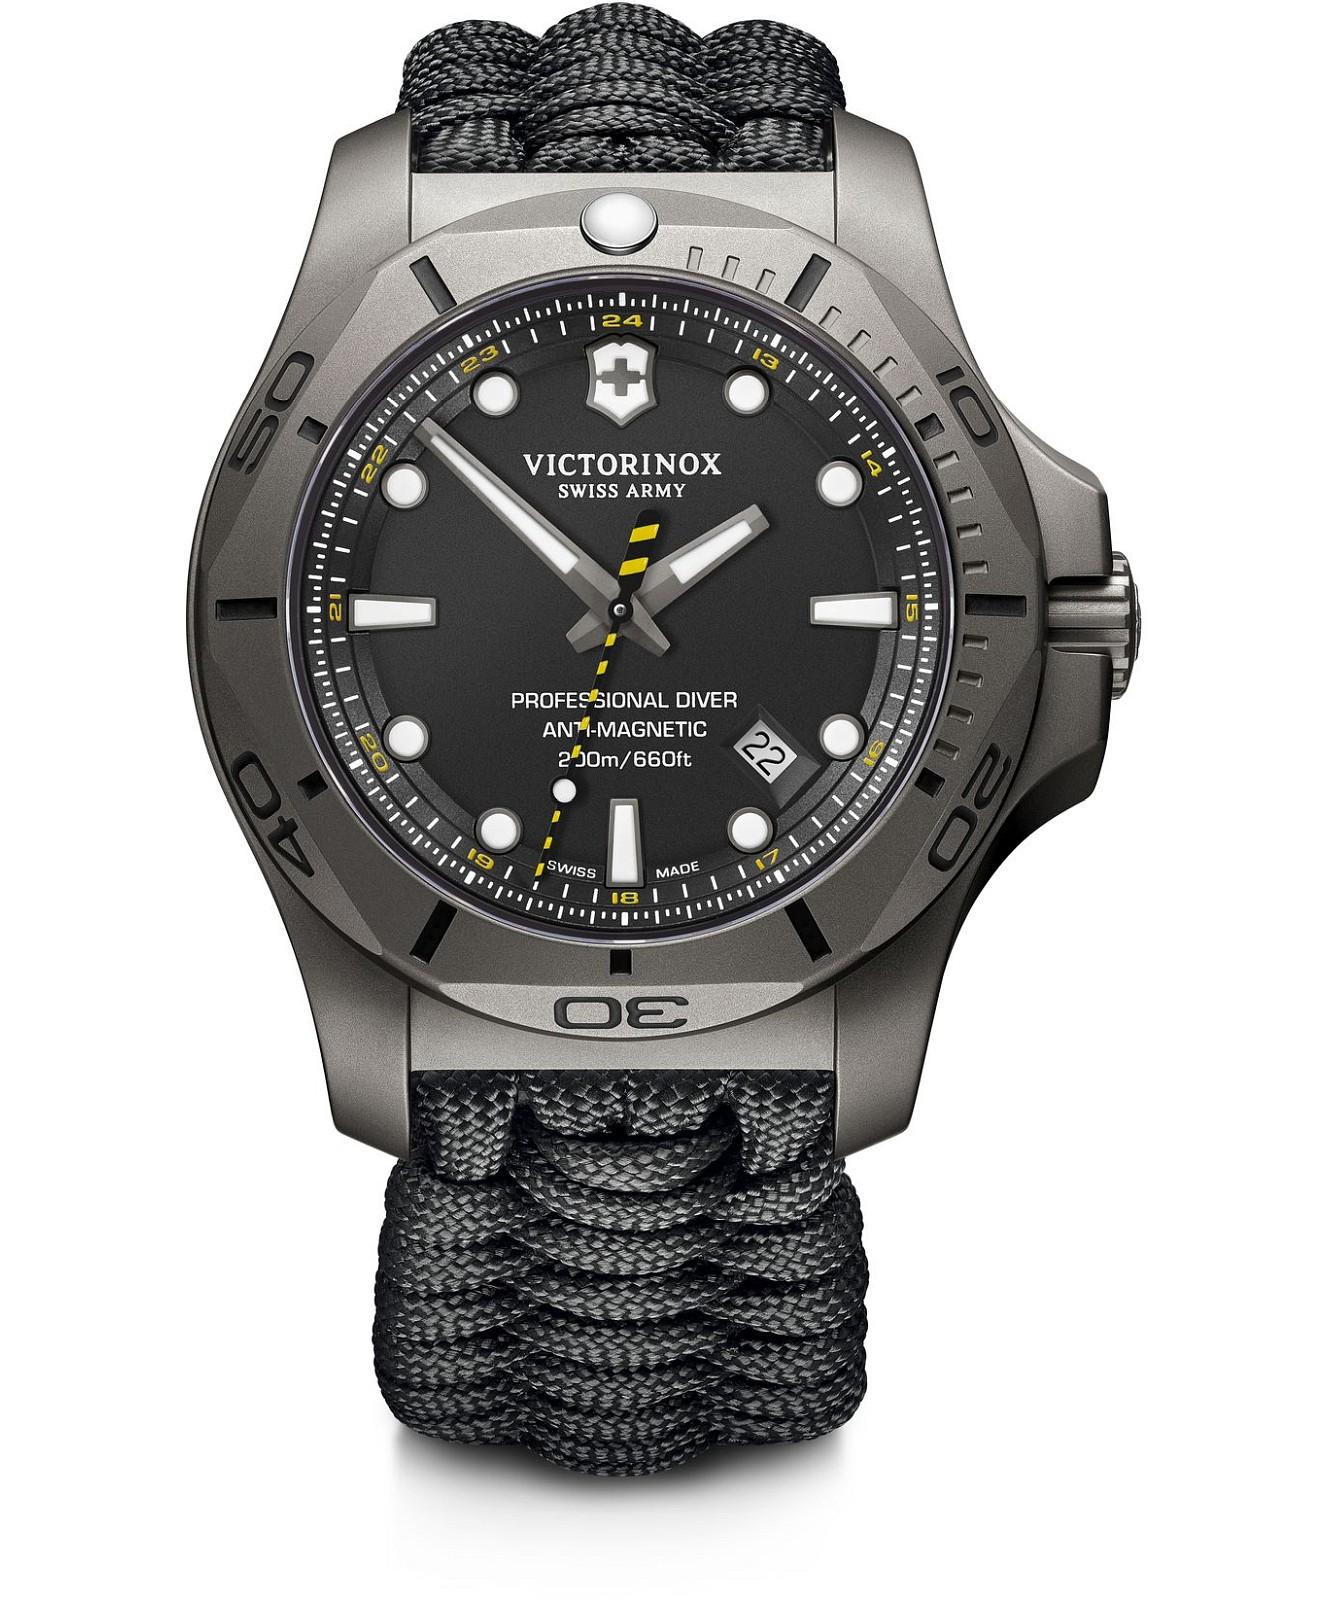 zegarek-meski-victorinox-i-n-o-x-professional-diver-241845_001